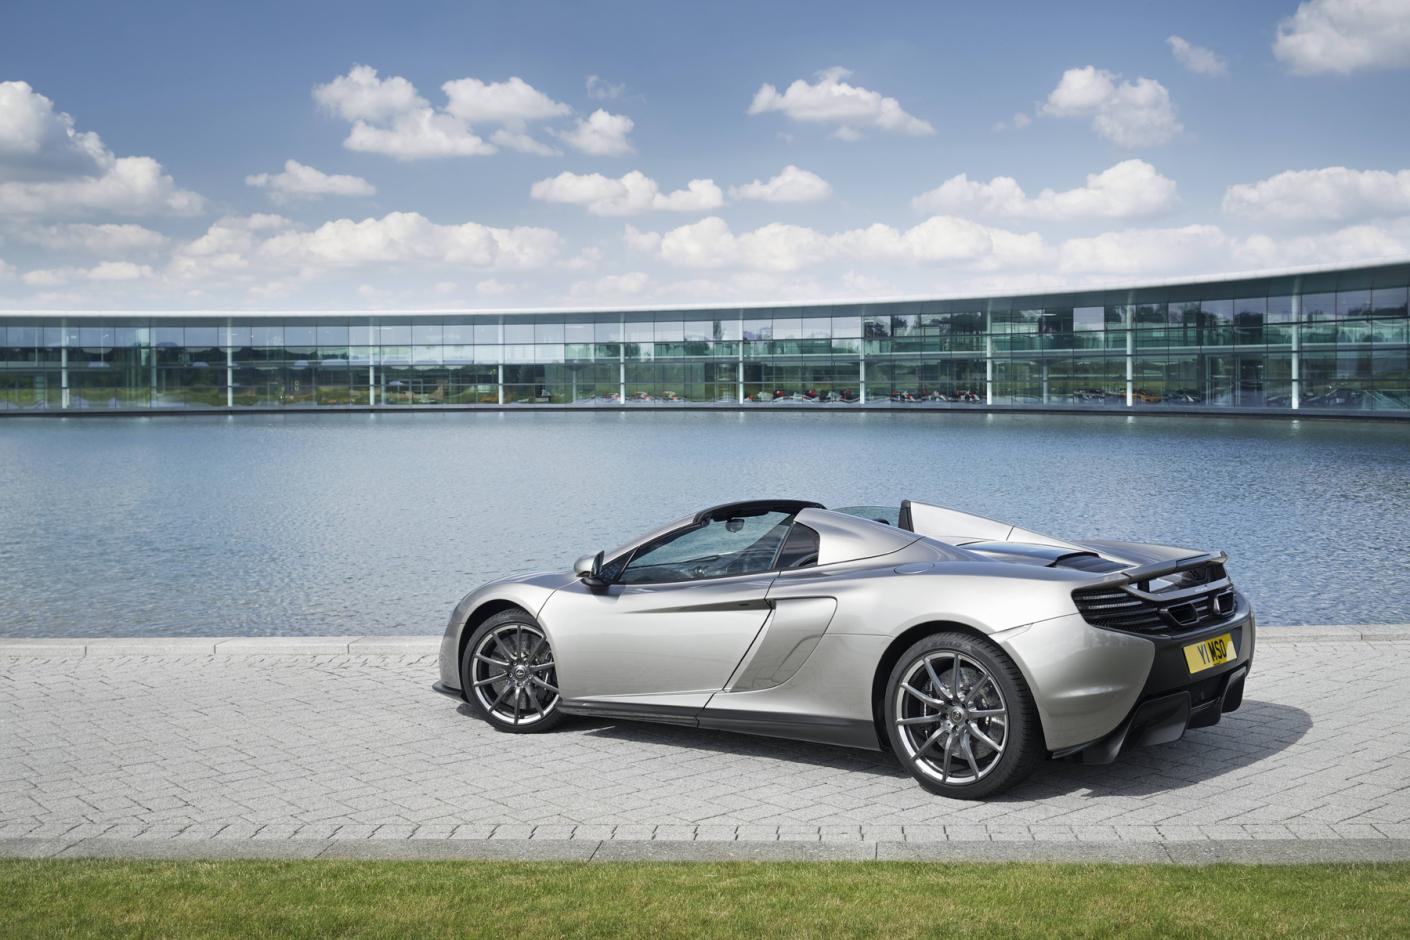 mclaren mso 650s 2 McLaren MSO 650S Supercar